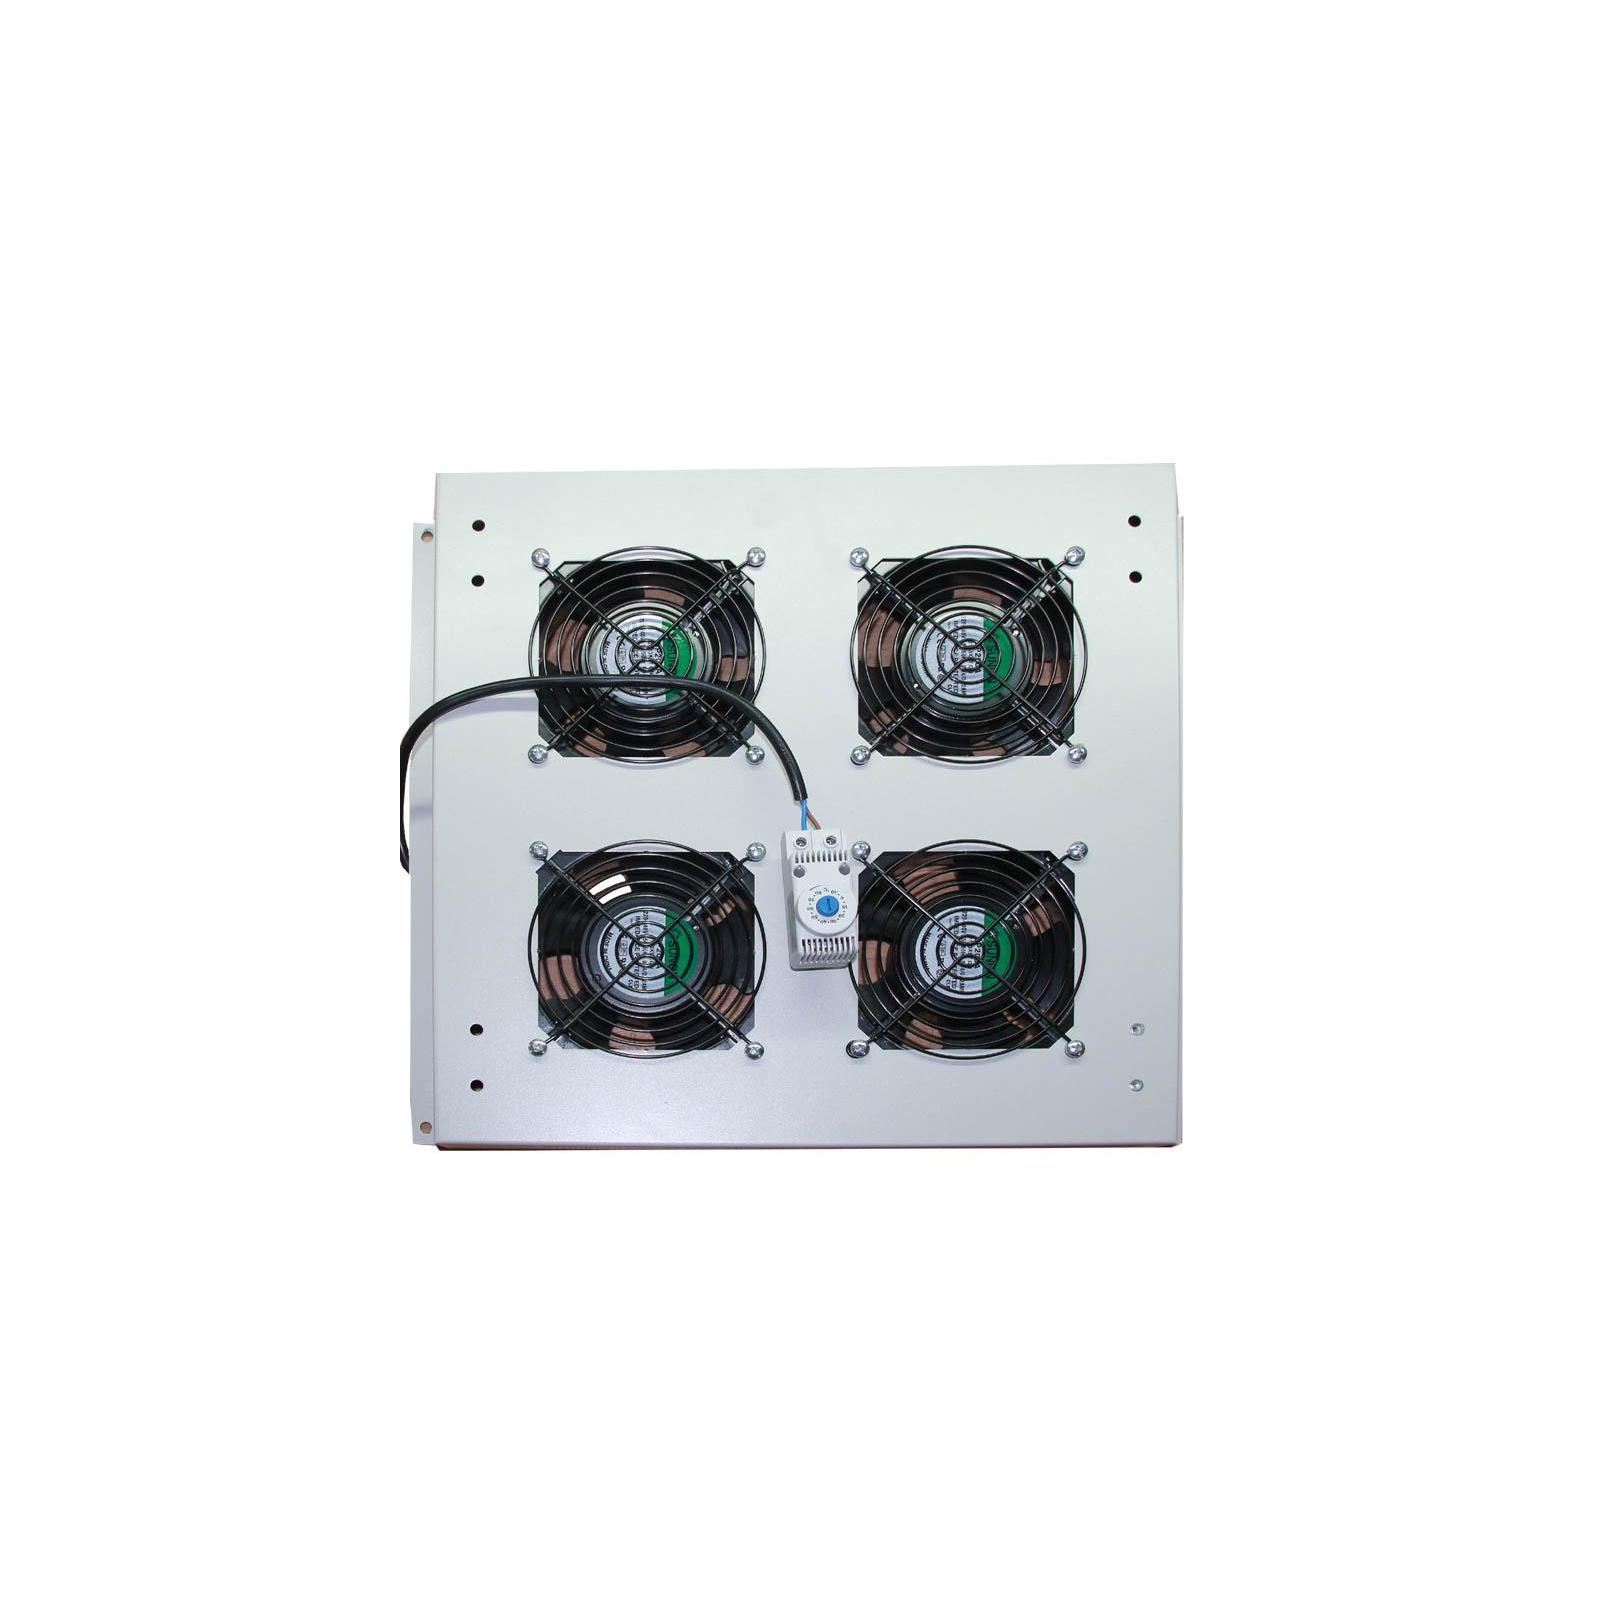 Вентиляторный модуль CSV 4 вентилятора для шкафа (00894)